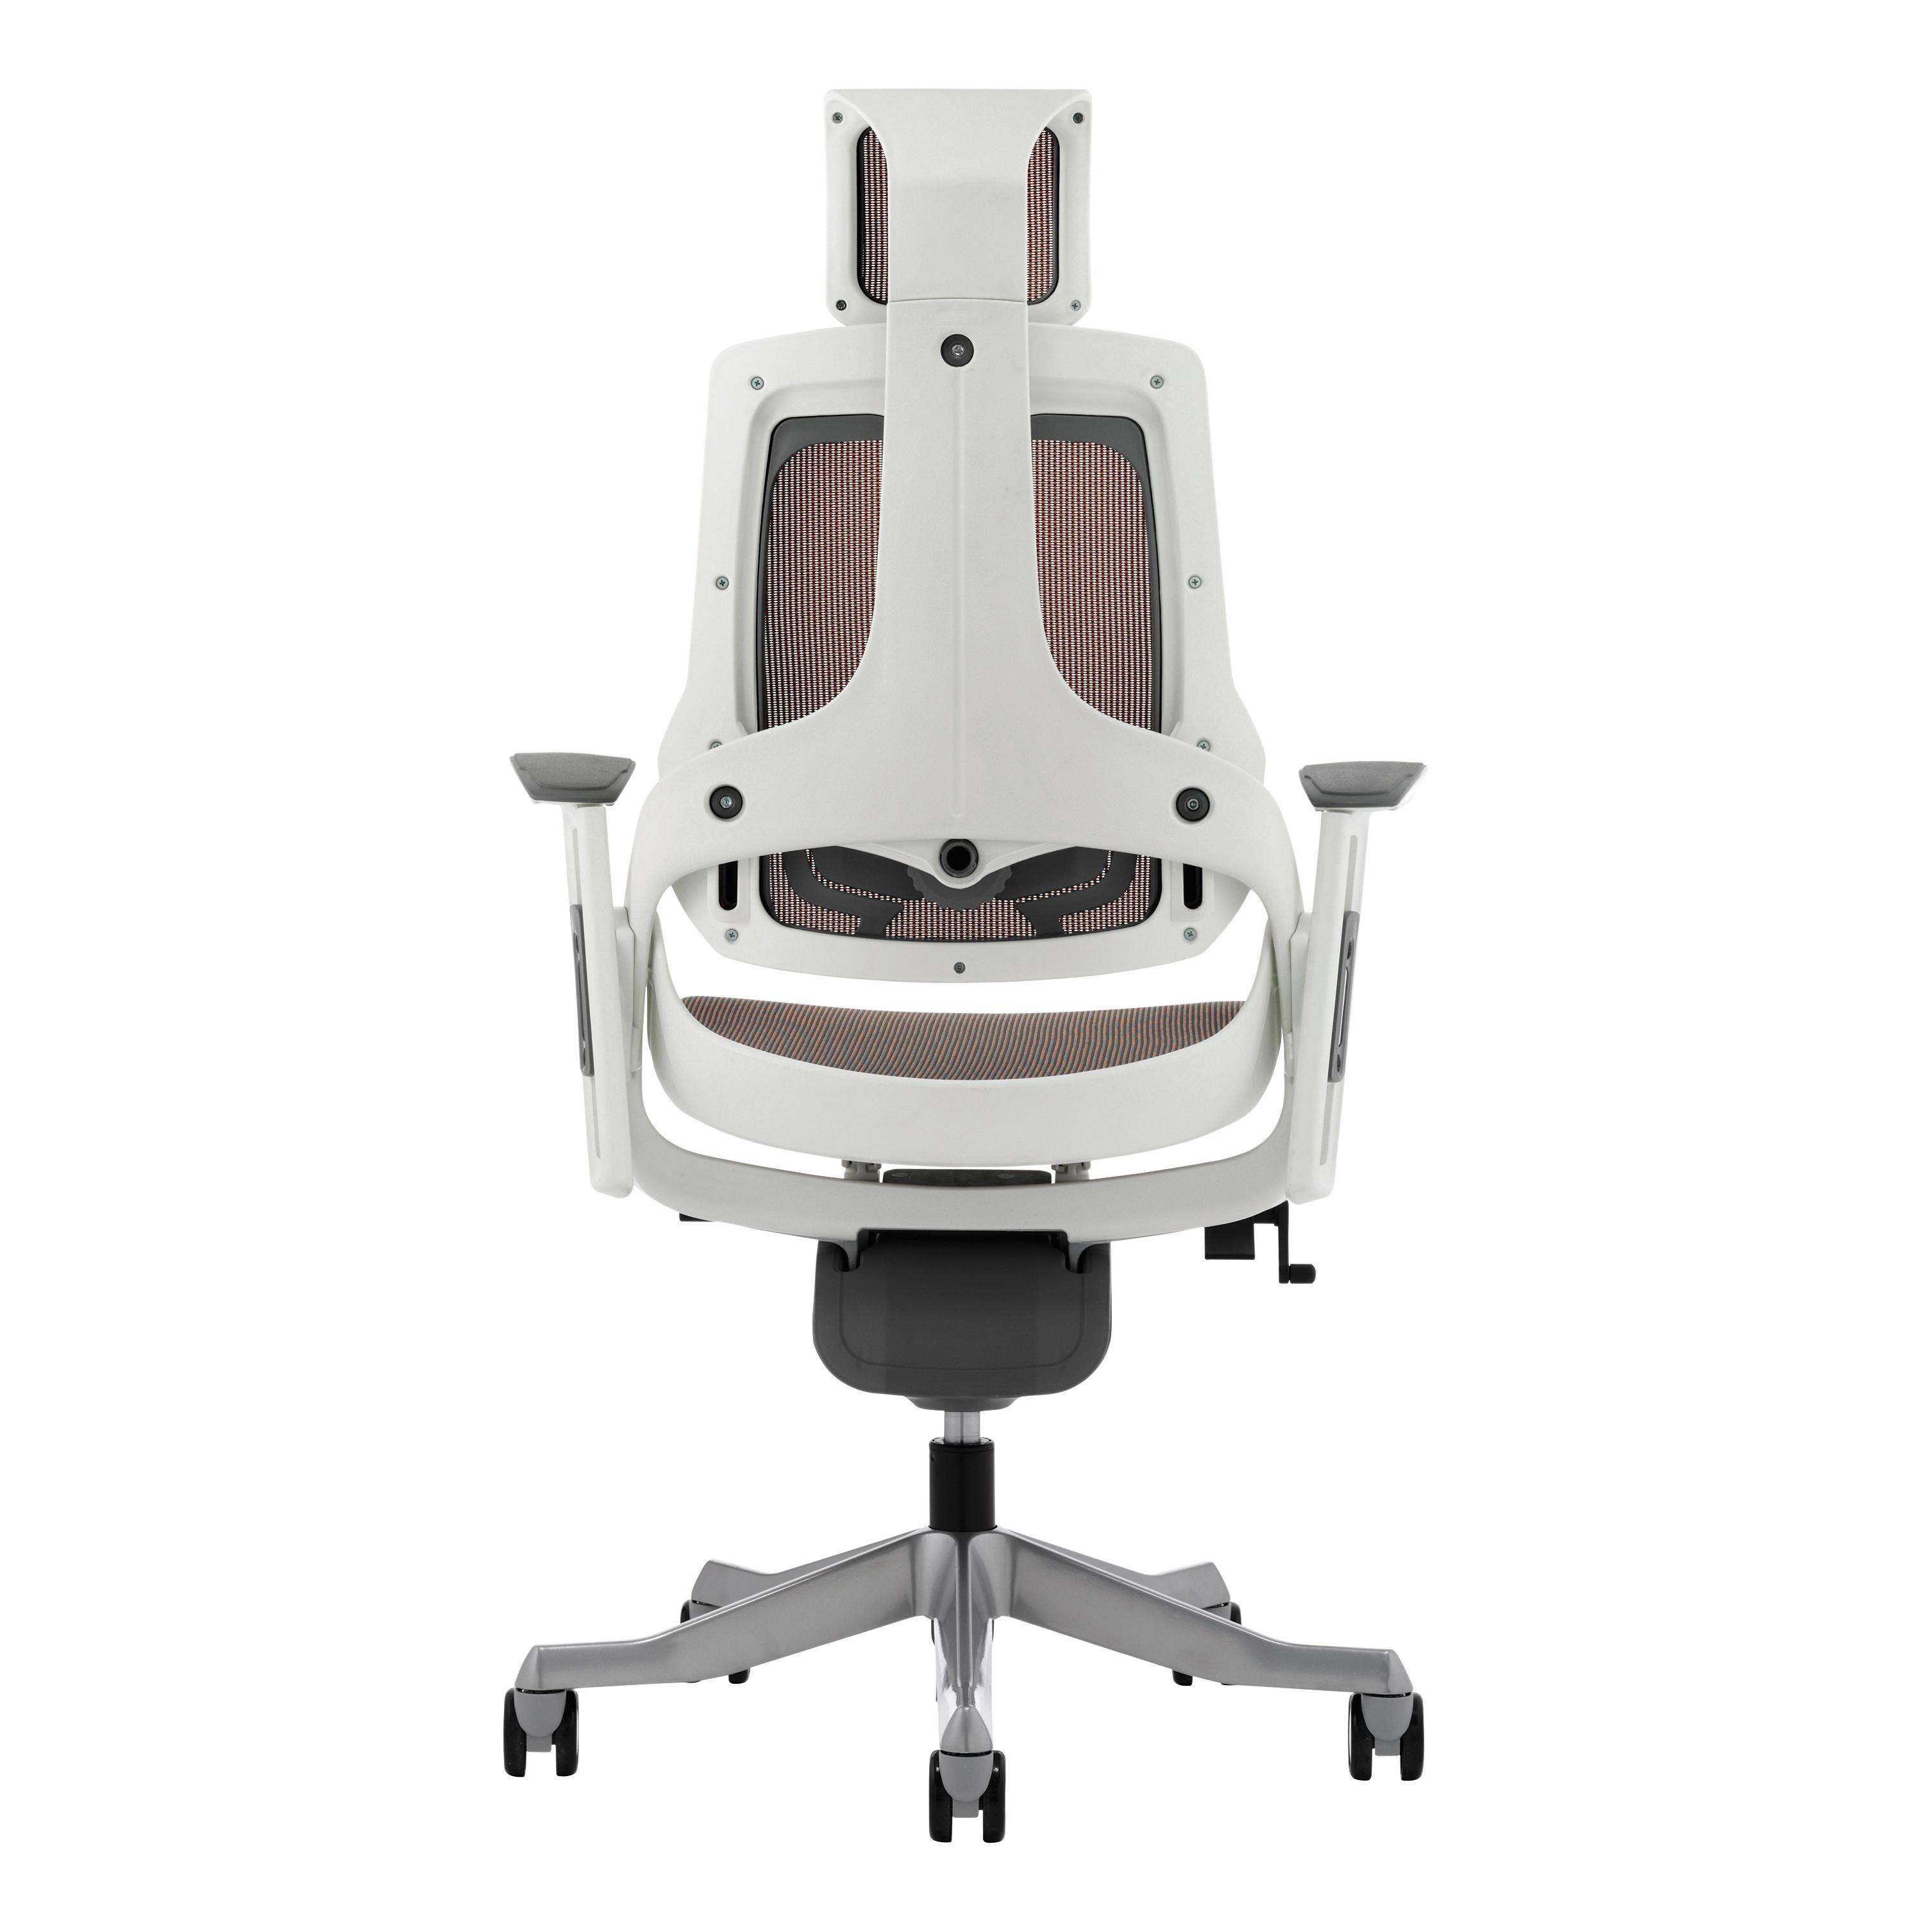 Adroit Zure White Frame Mesh Head Rest Mandarin 565x520x450-550mm Ref KC0163